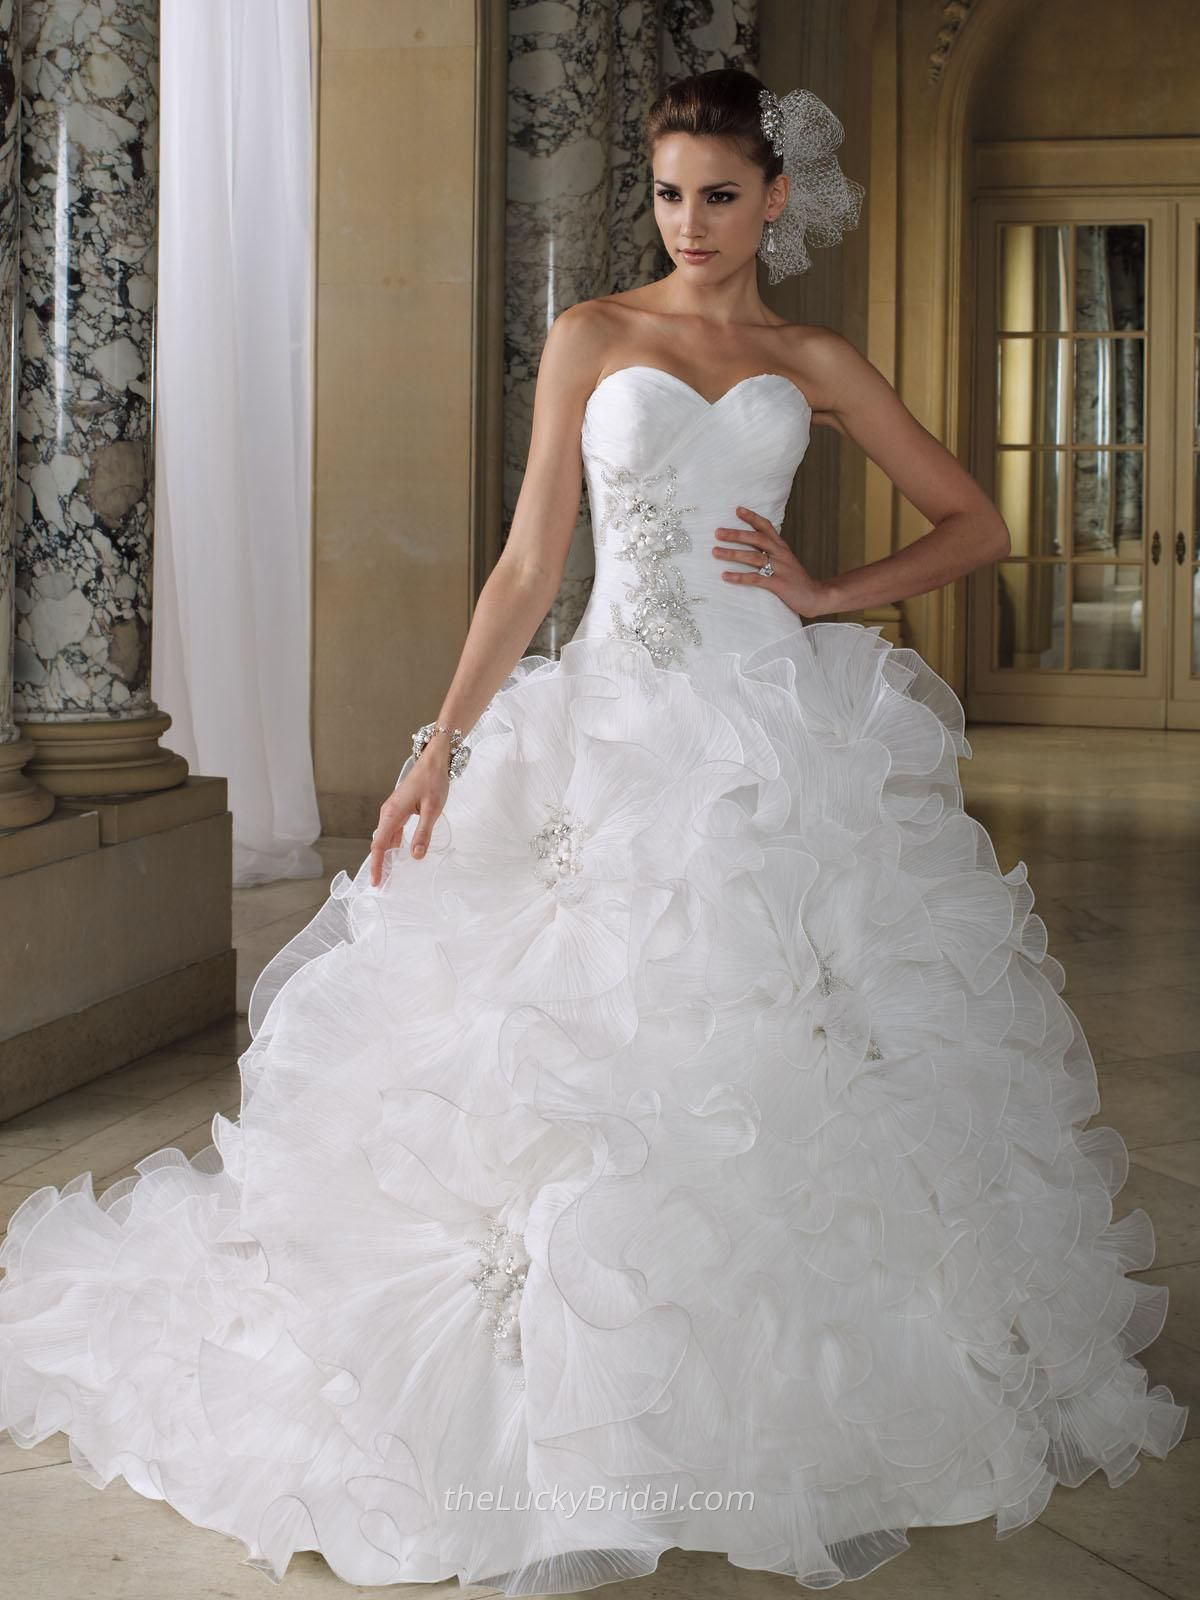 crystal pleated organza ruffled luxury sweetheart ball gown wedding dress